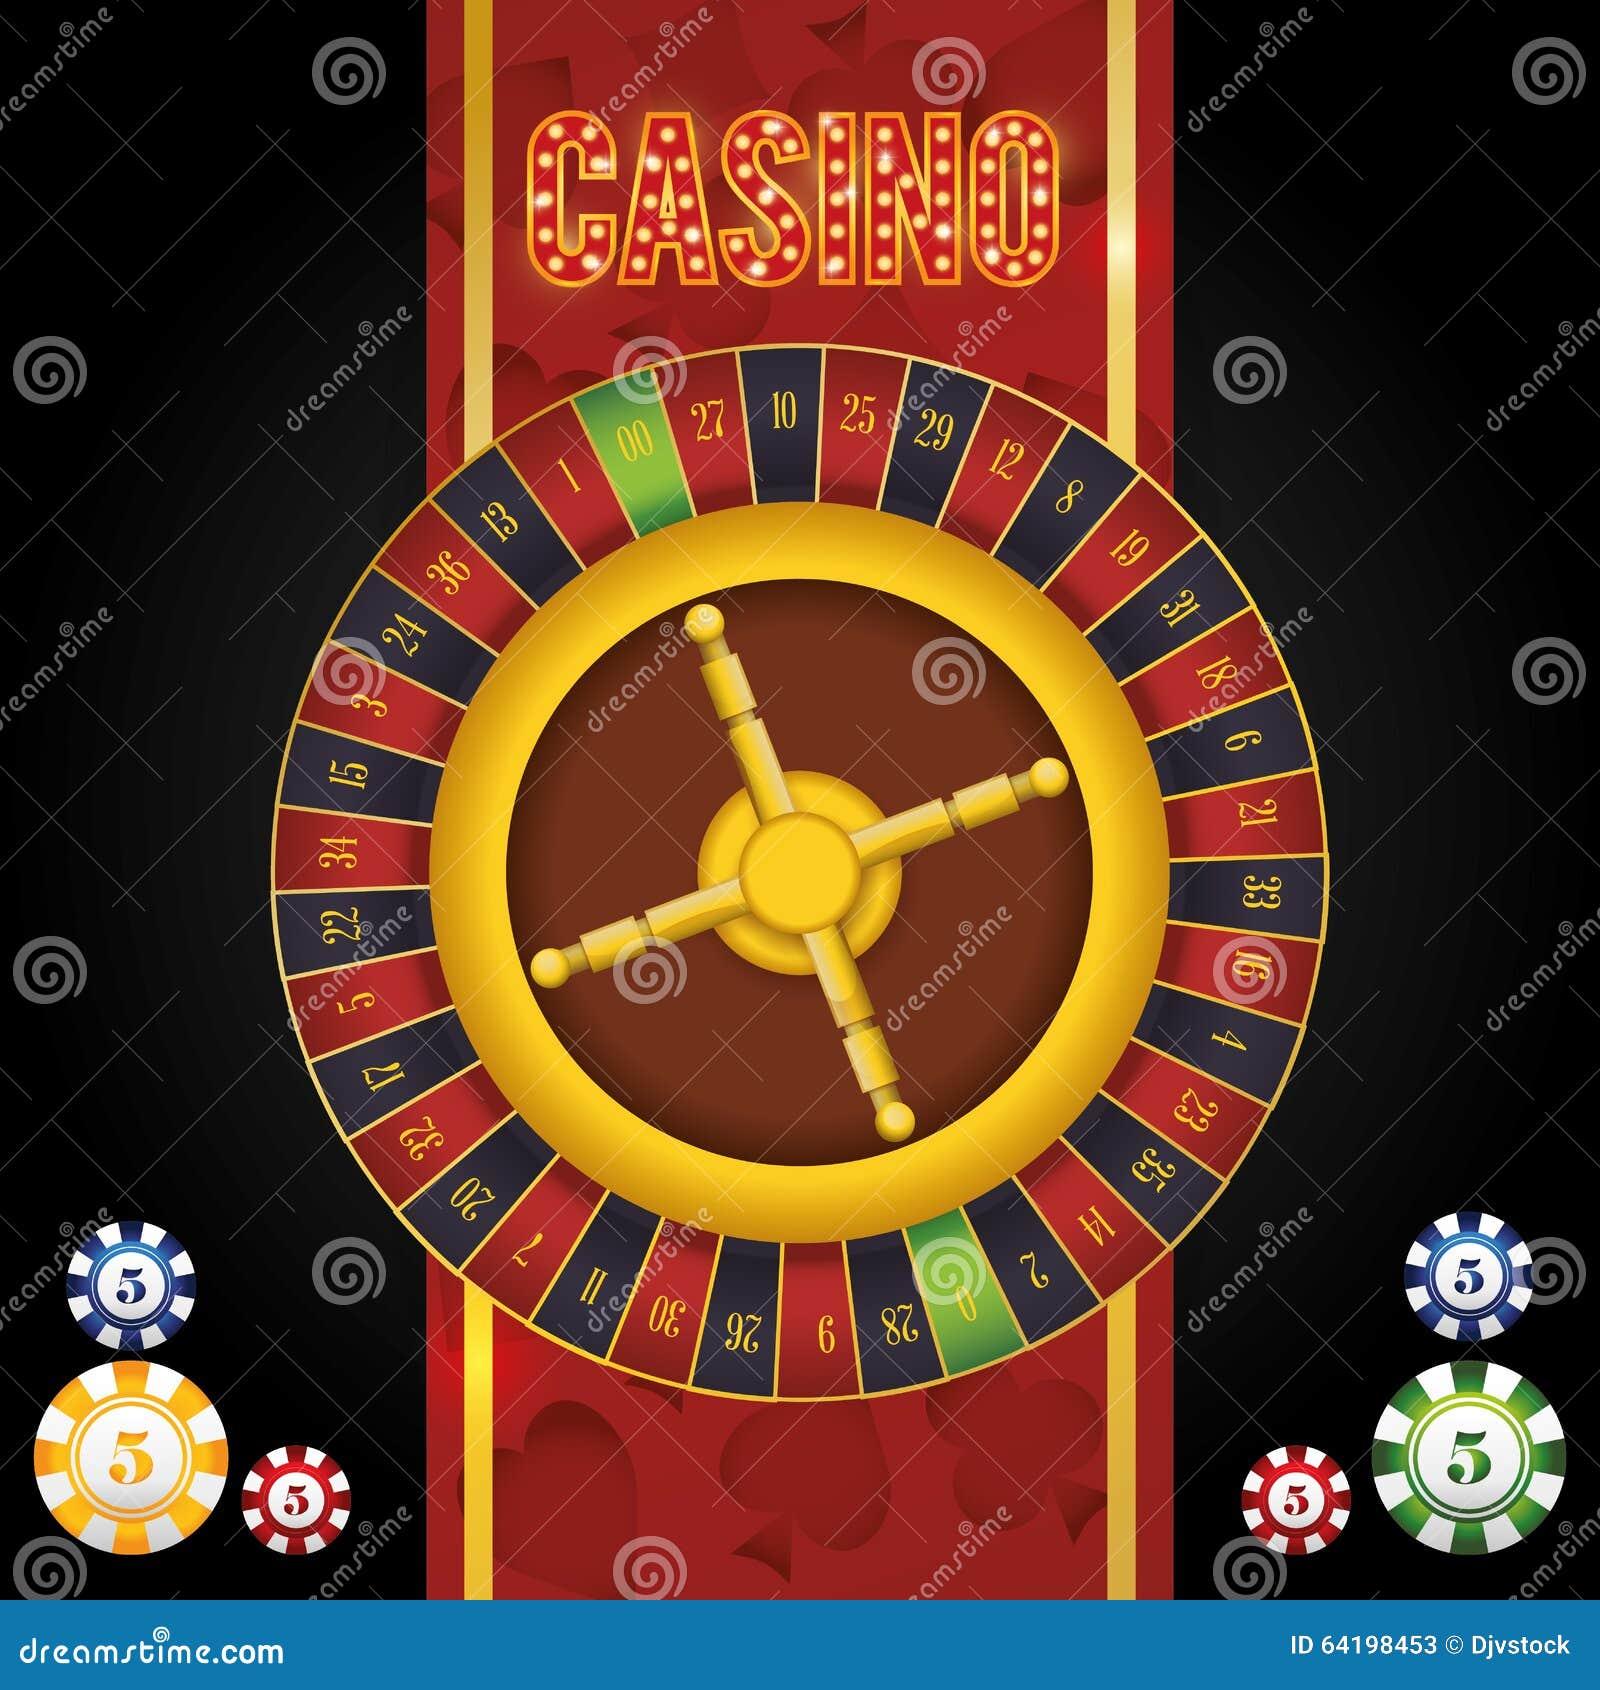 Casino icons design stock illustration image 64198453 for Architectural design concepts las vegas